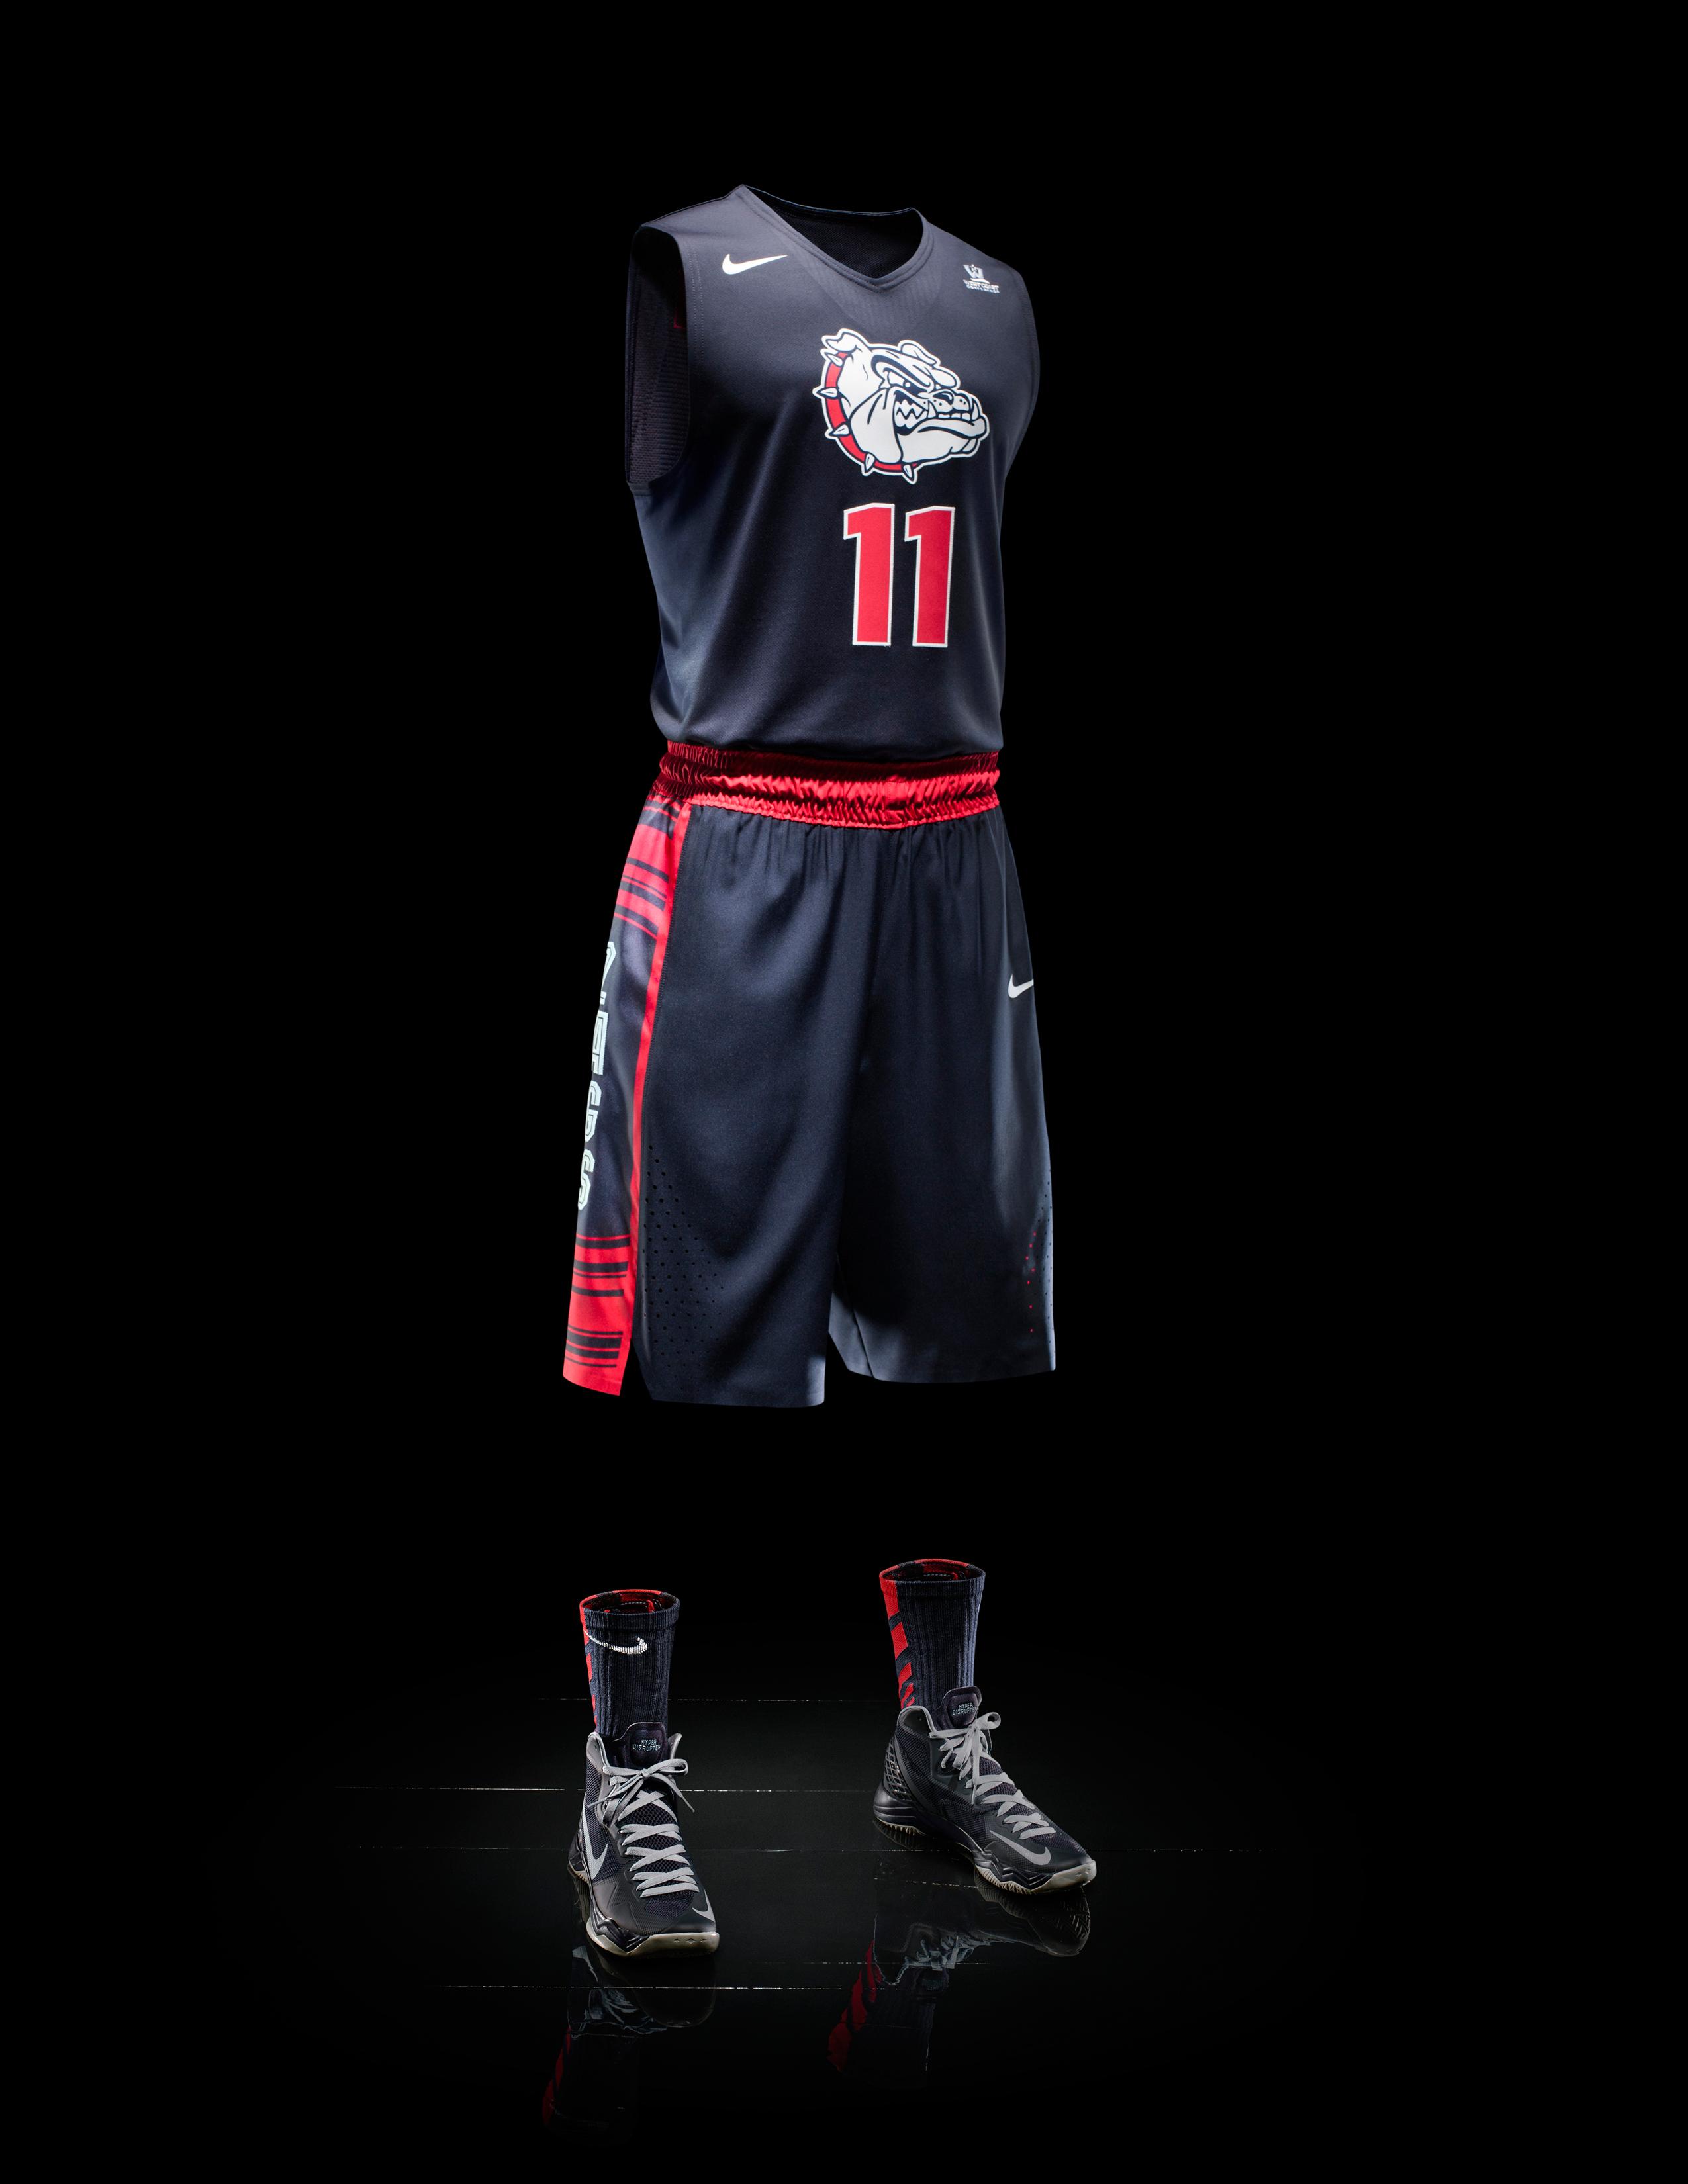 sneakers for cheap 6d48b d6ddd Nike Custom Basketball Shirts | Top Mode Depot